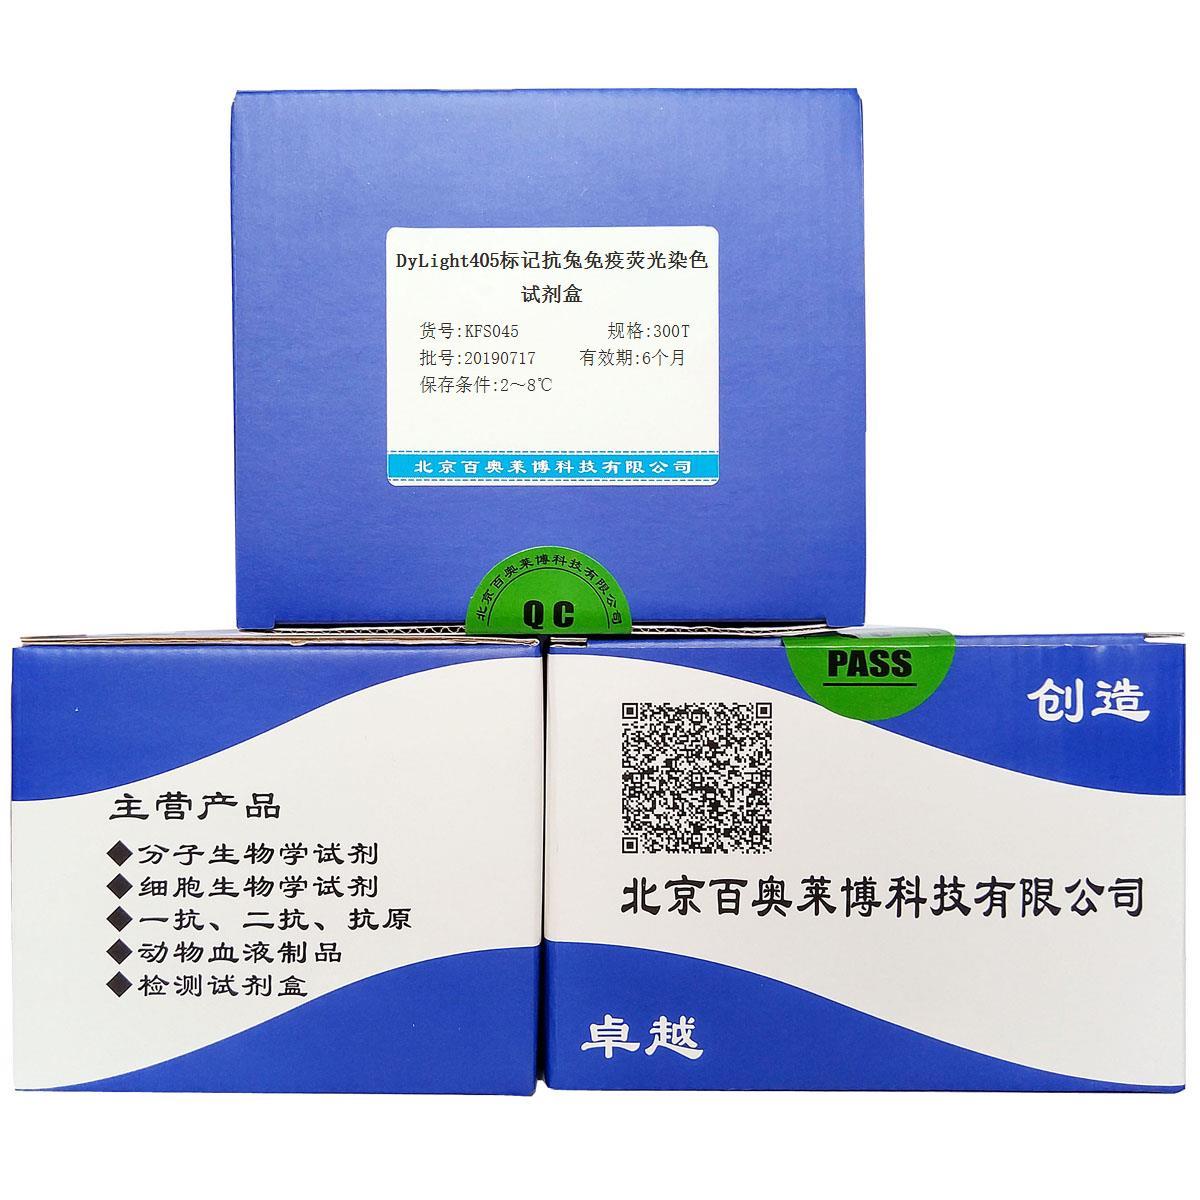 DyLight405标记抗兔免疫荧光染色试剂盒